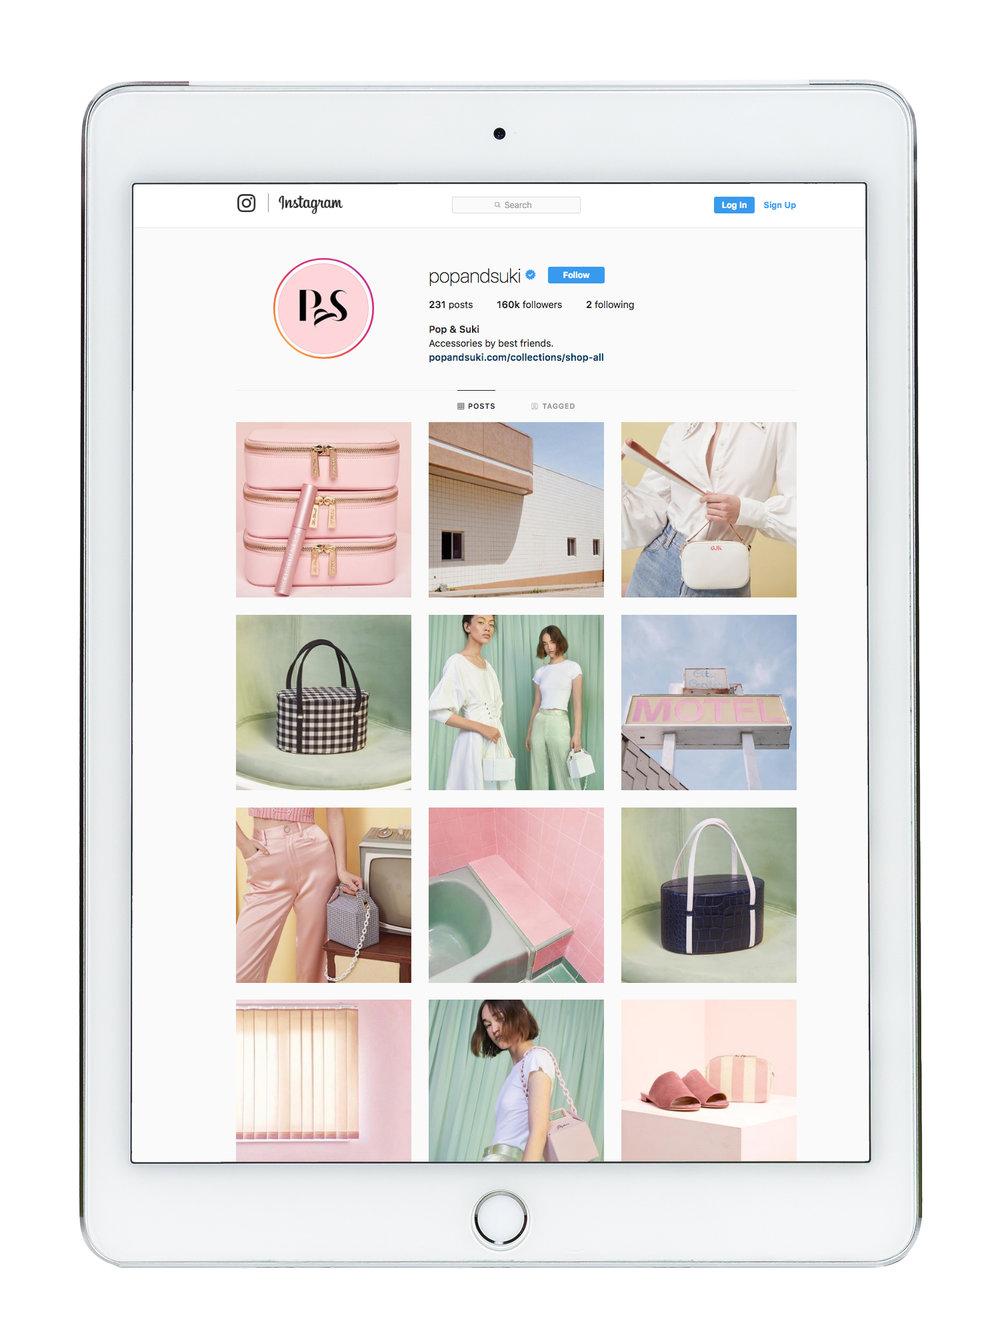 pop and suki instagram mock on ipad.jpg